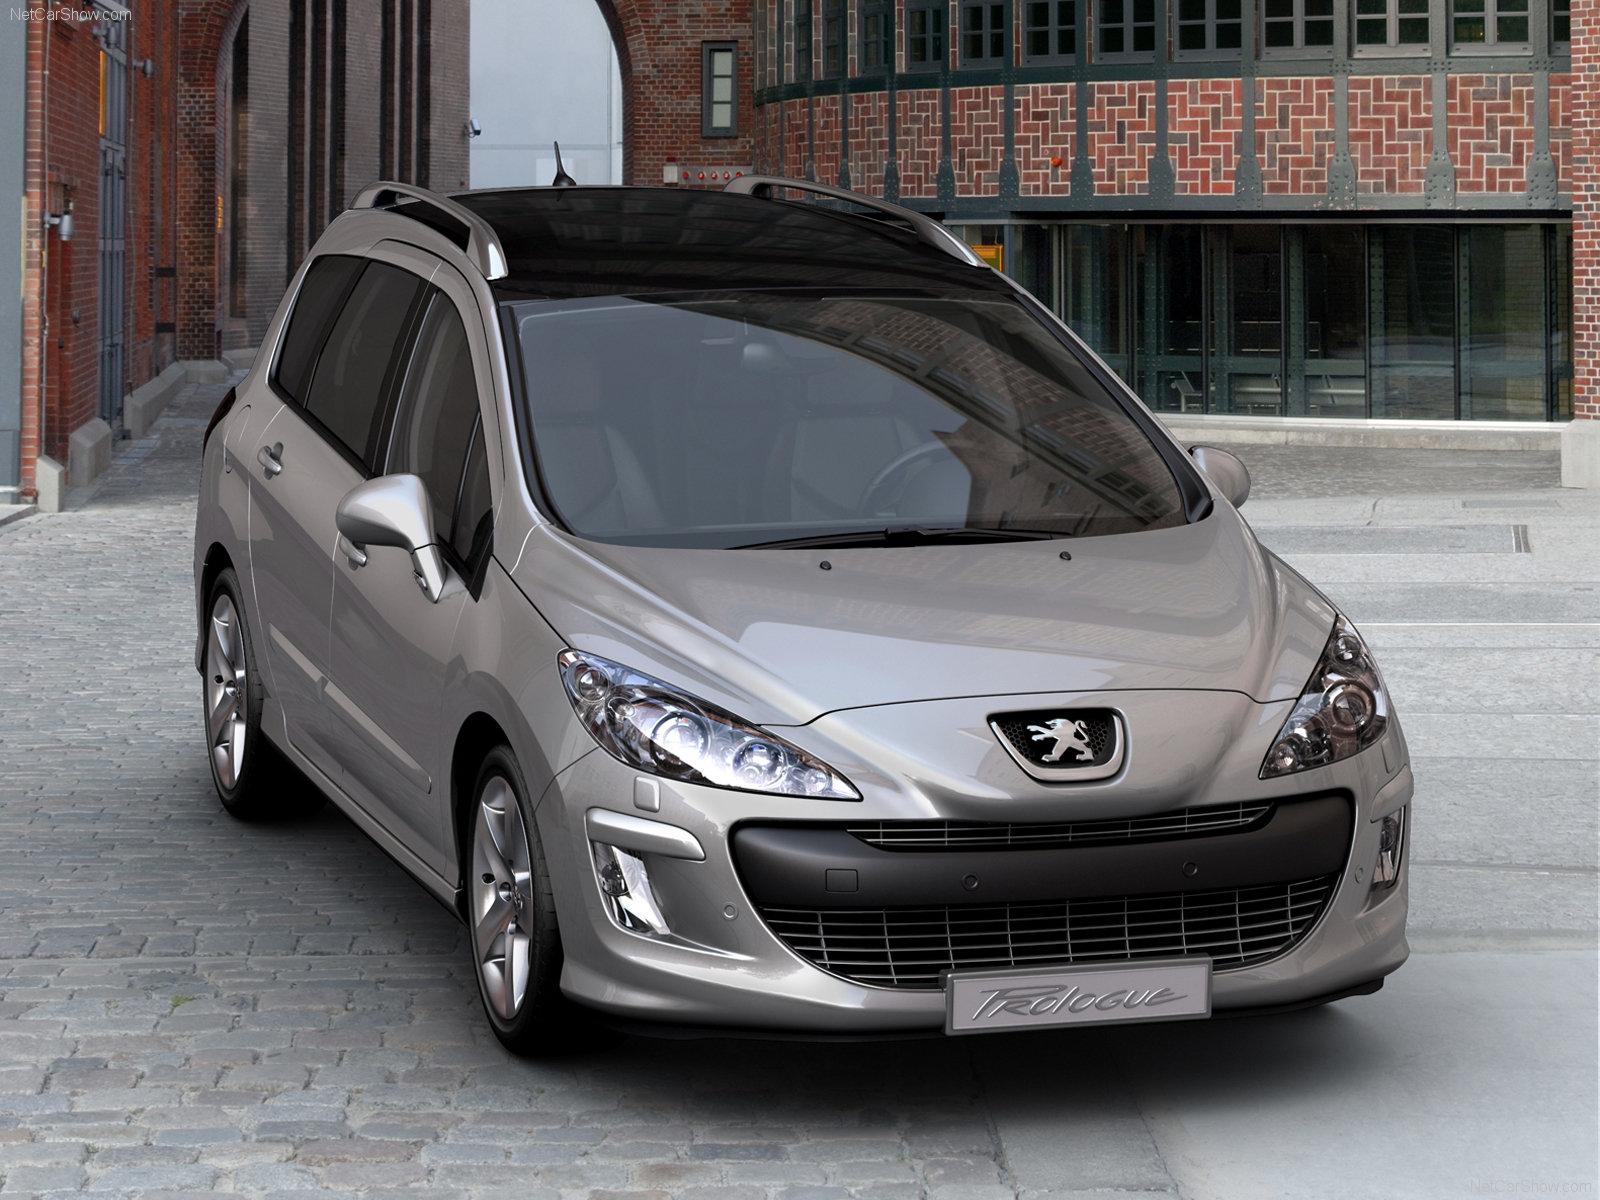 https://www.carsbase.com/photo/Peugeot-308_SW_Prologue_mp40_pic_46835.jpg